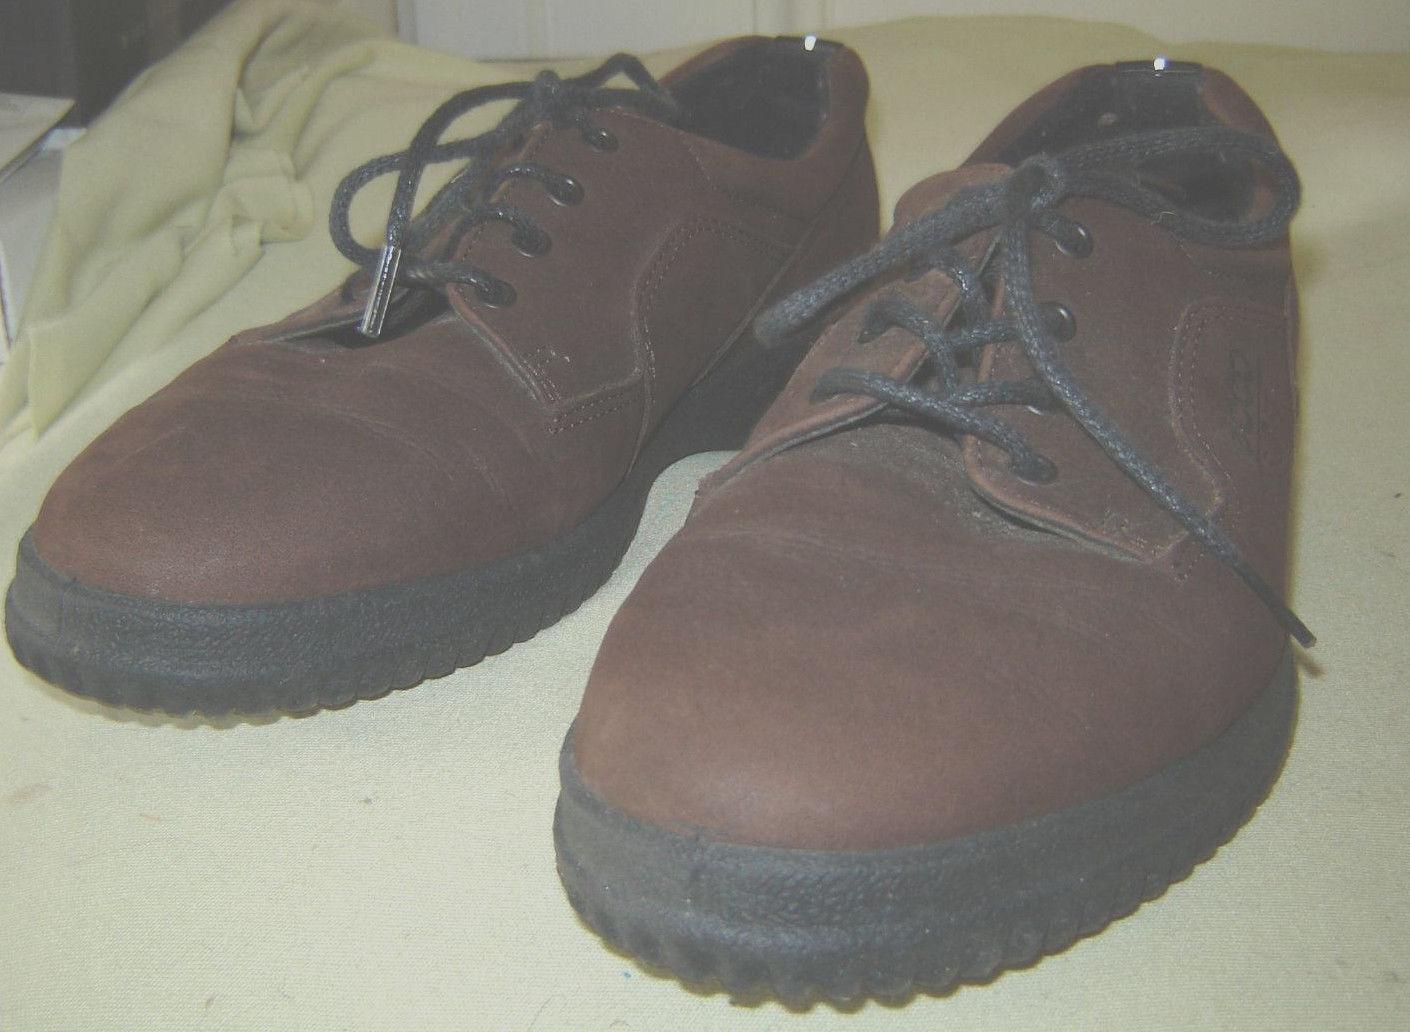 Ecco Brown  Walking Shoe Size 9 or 40/Med. width - $14.85